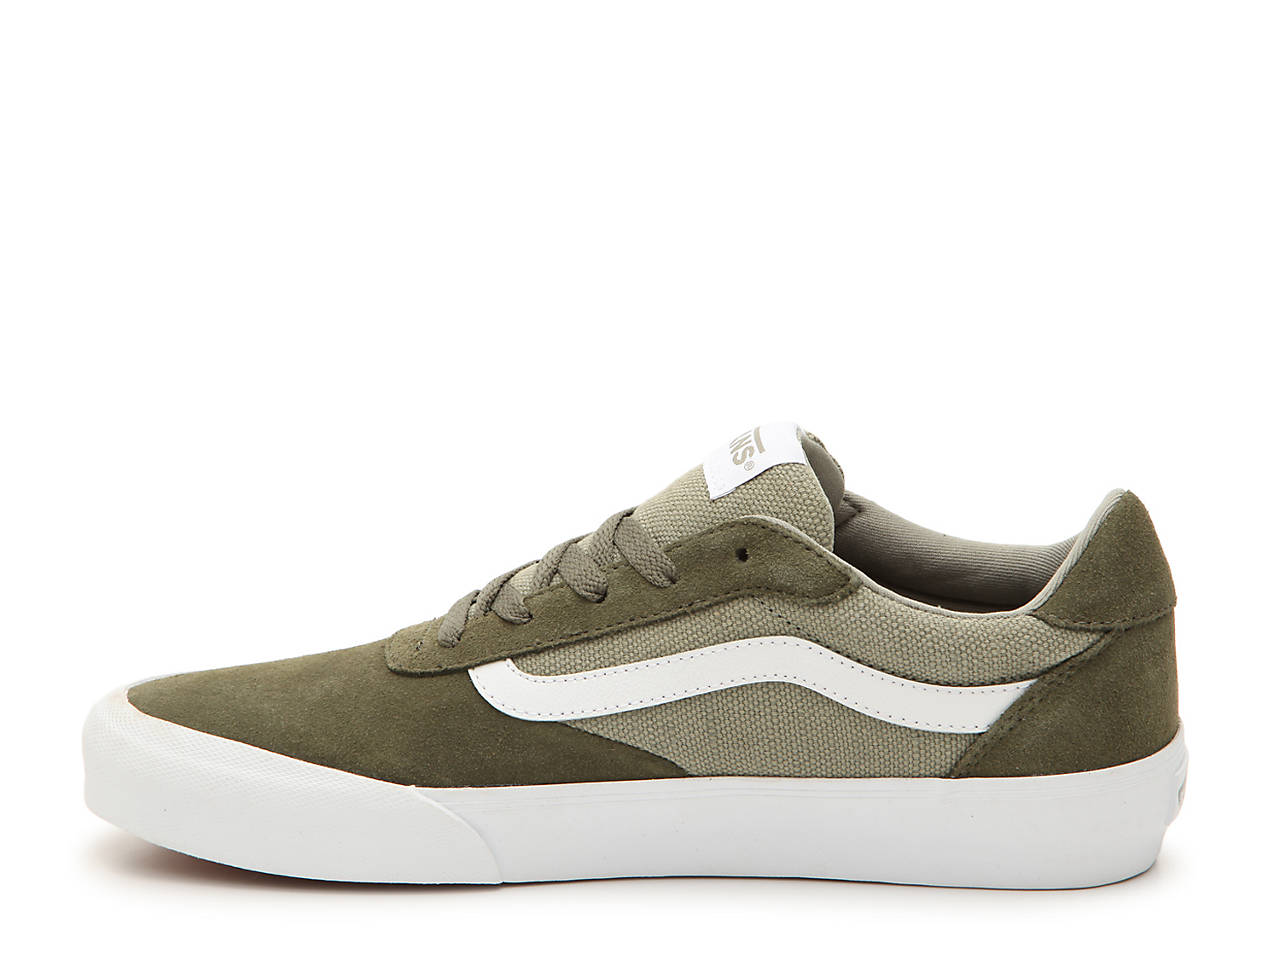 52eab1fea46 Vans Palomar Sneaker - Men s Men s Shoes